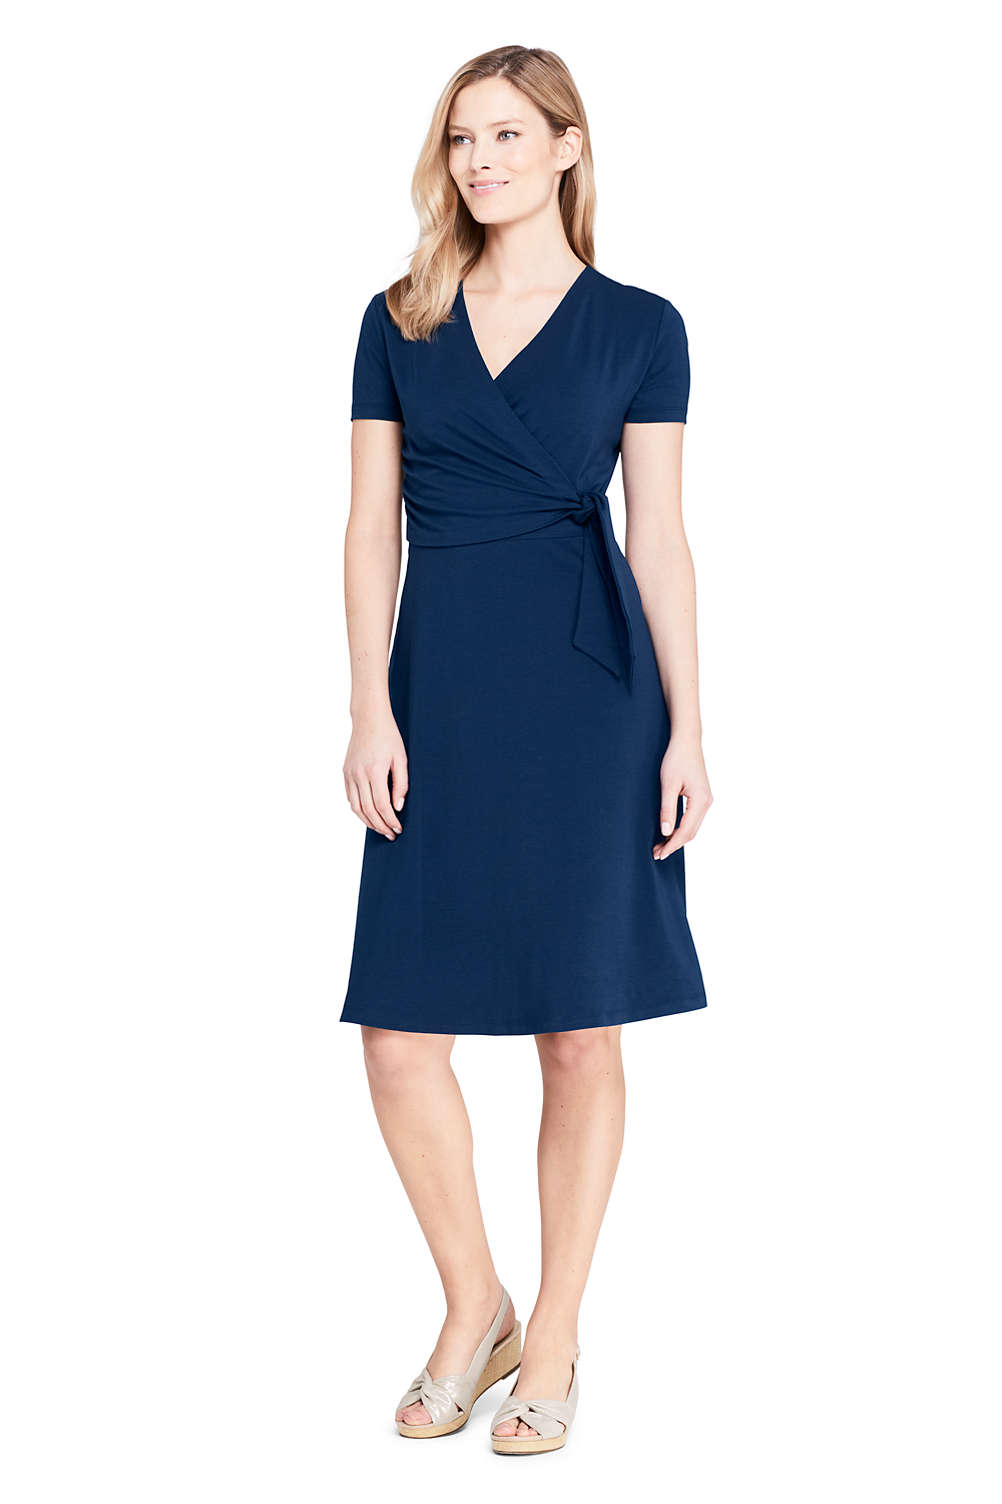 Women s Short Sleeve Knit Faux Wrap Dress from Lands  End f1c592351